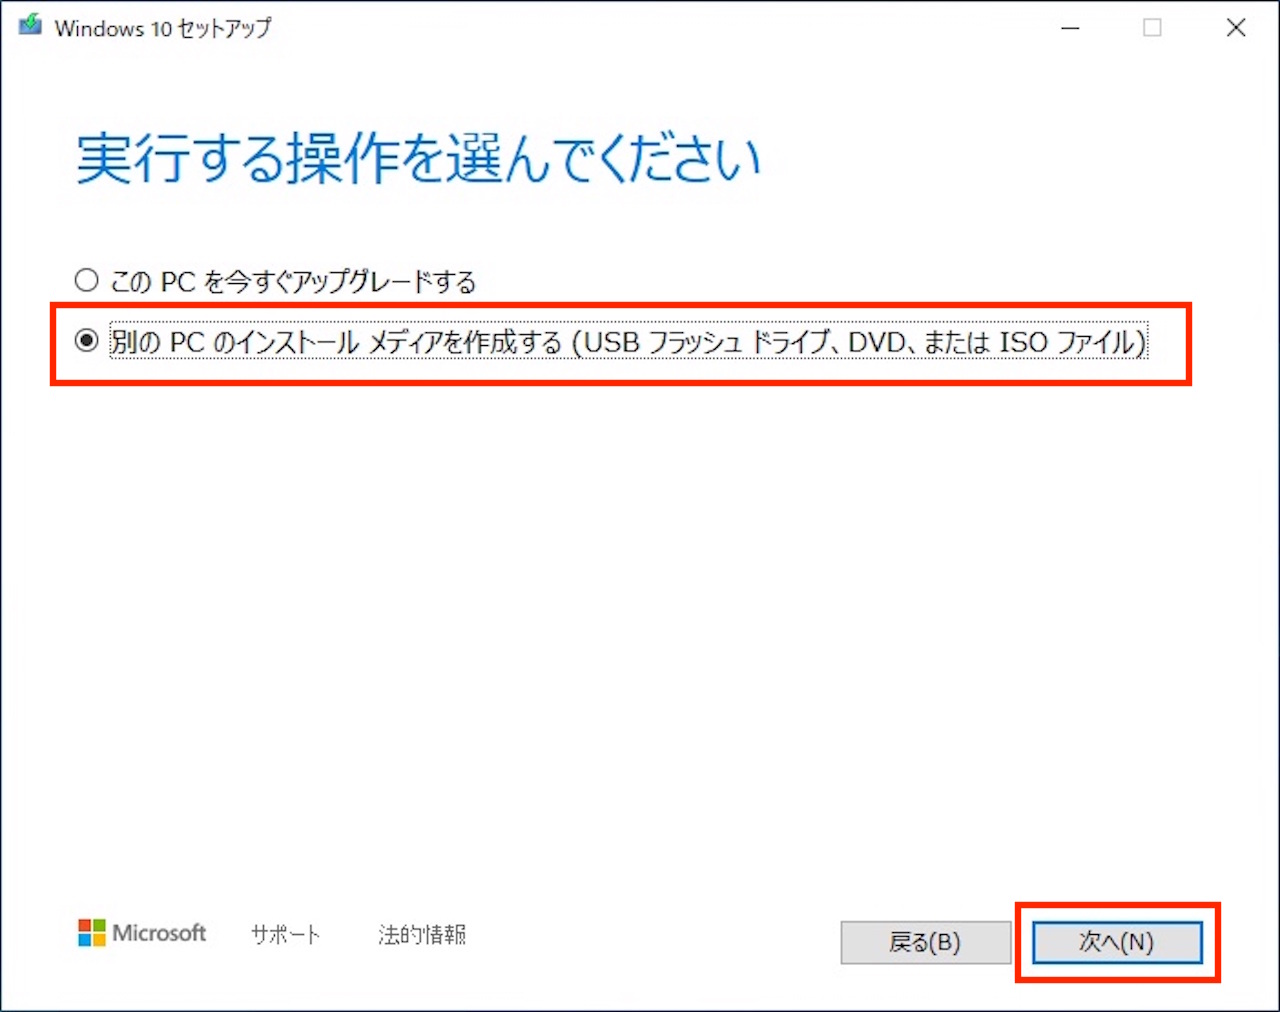 Windows10のインストール用USBメモリの作成方法⑧